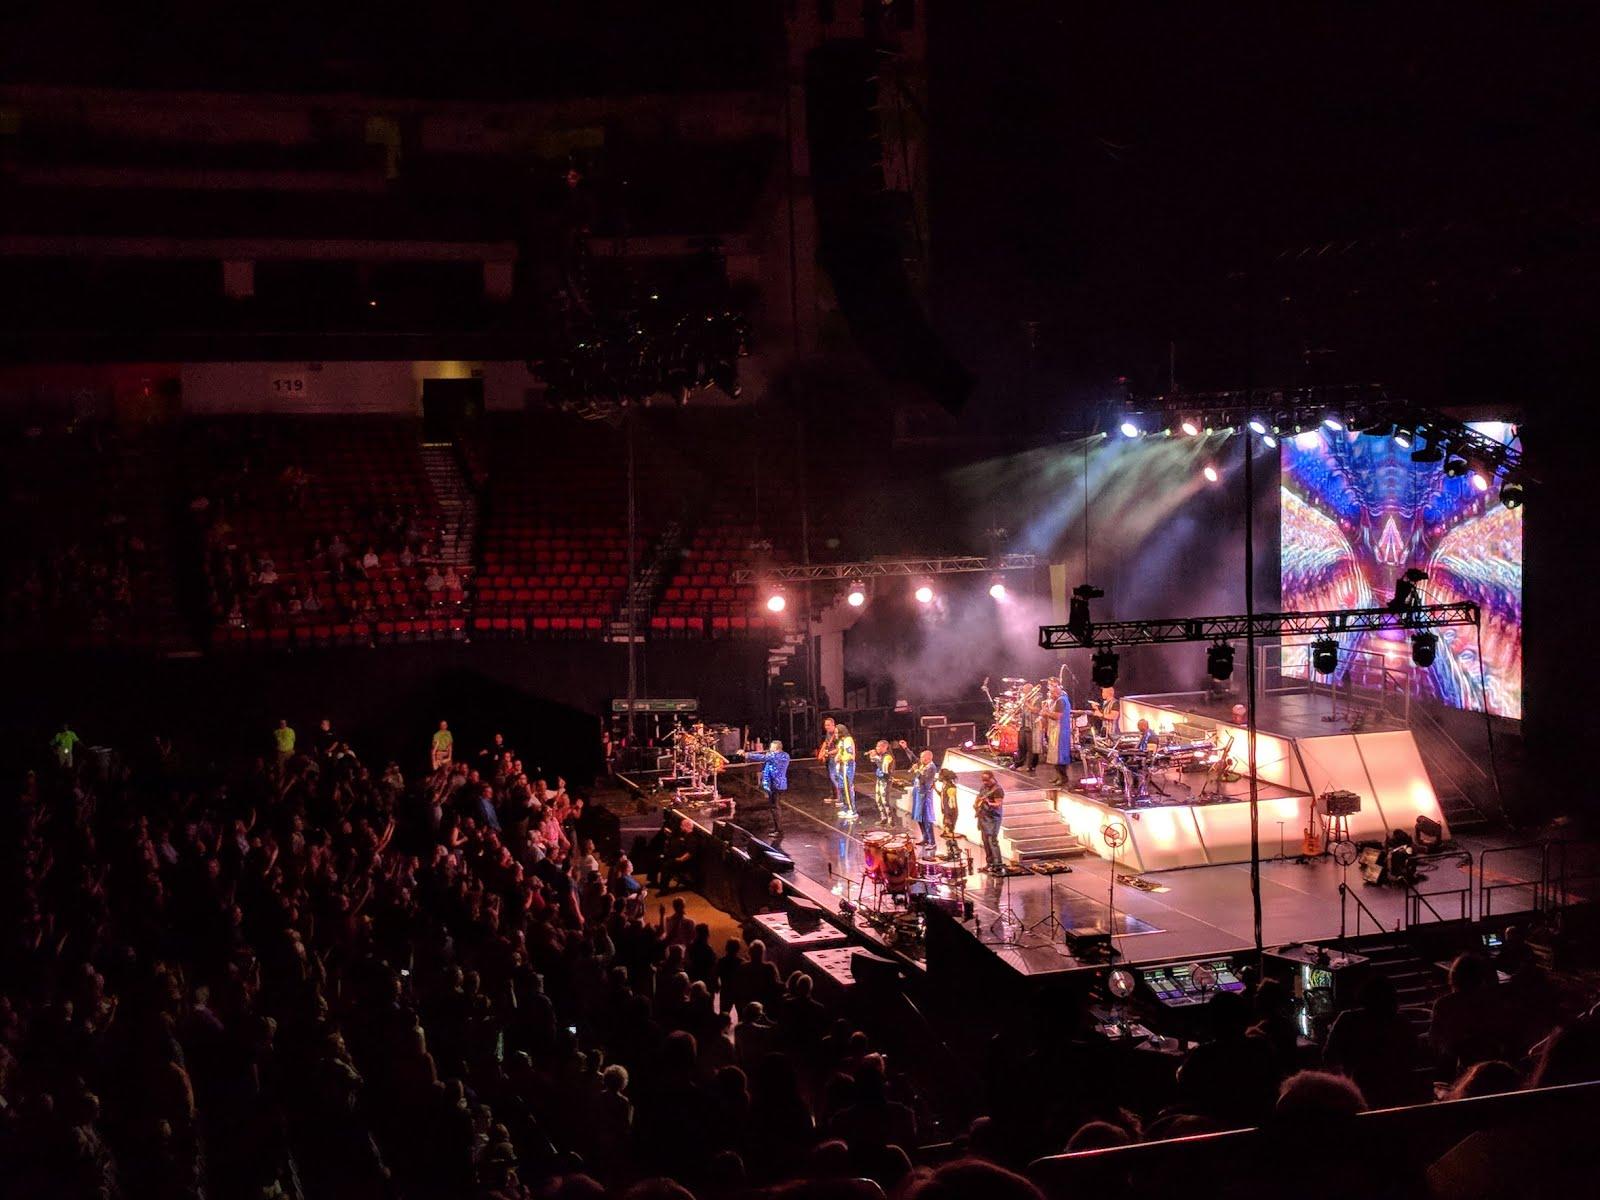 Earth Wind & Fire concert funk big band brass vocal guitar show